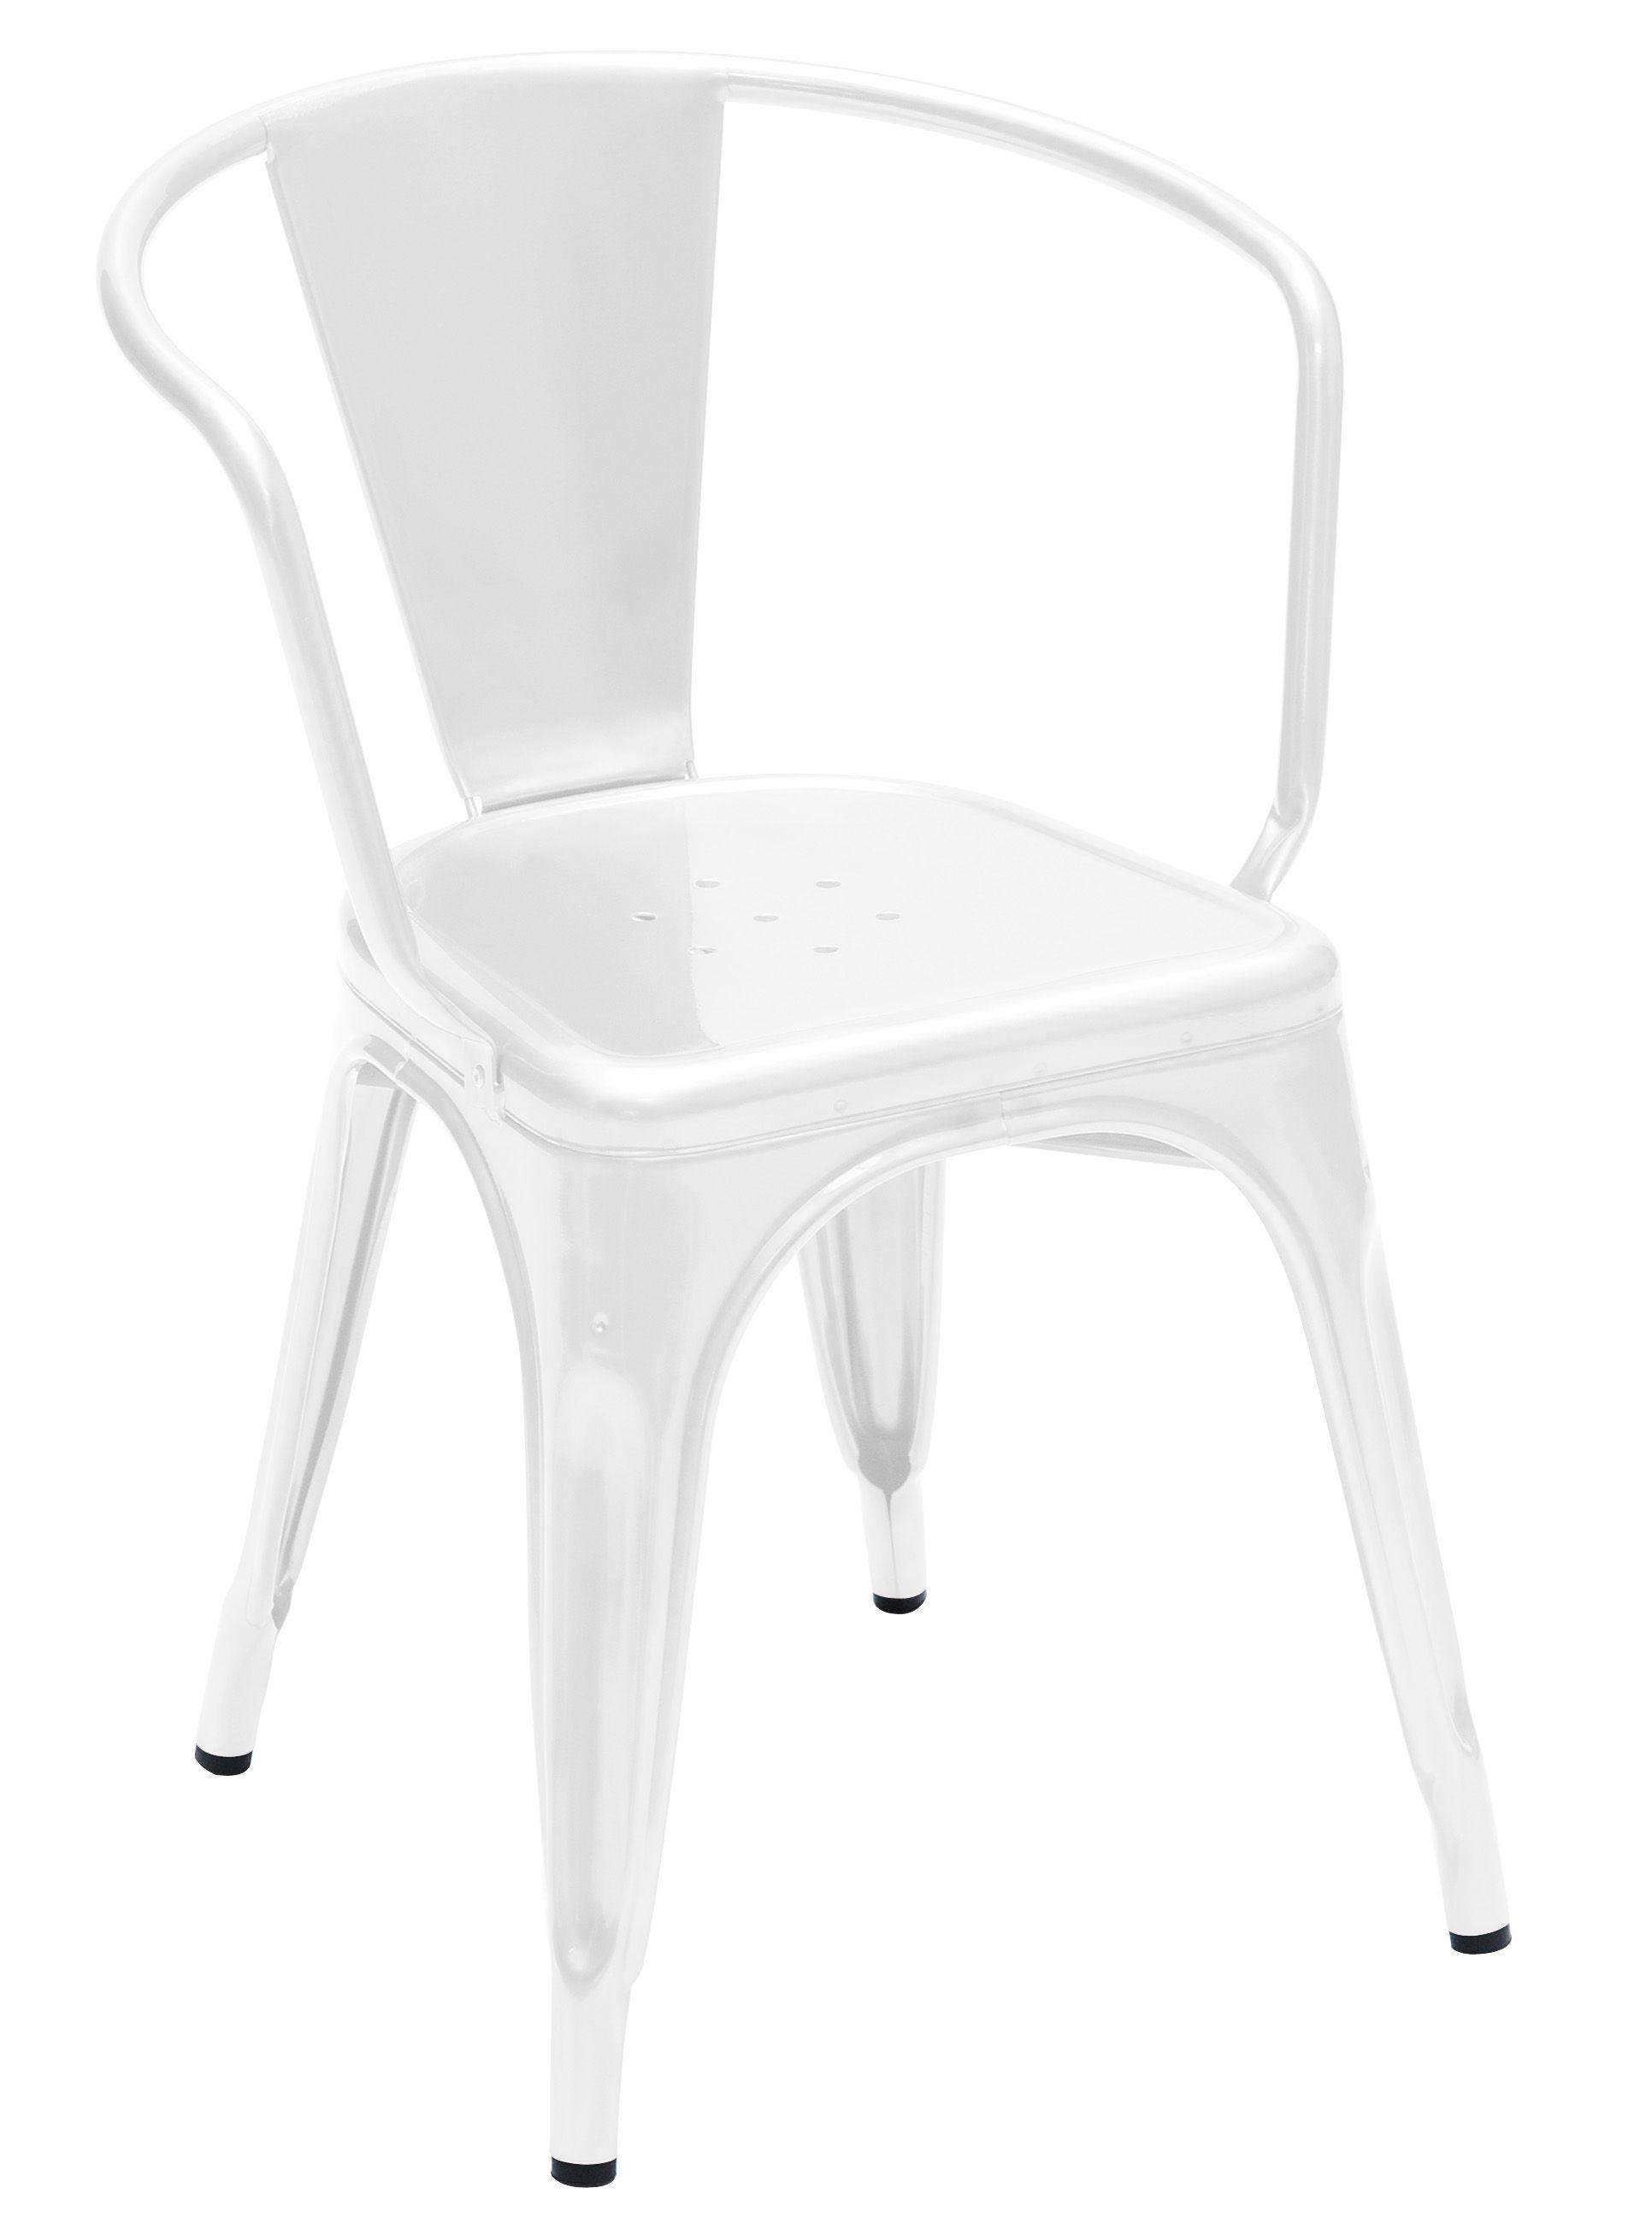 Möbel - Stühle  - A56 Sessel lackierter Stahl - Tolix - Weiß - Acier recyclé laqué